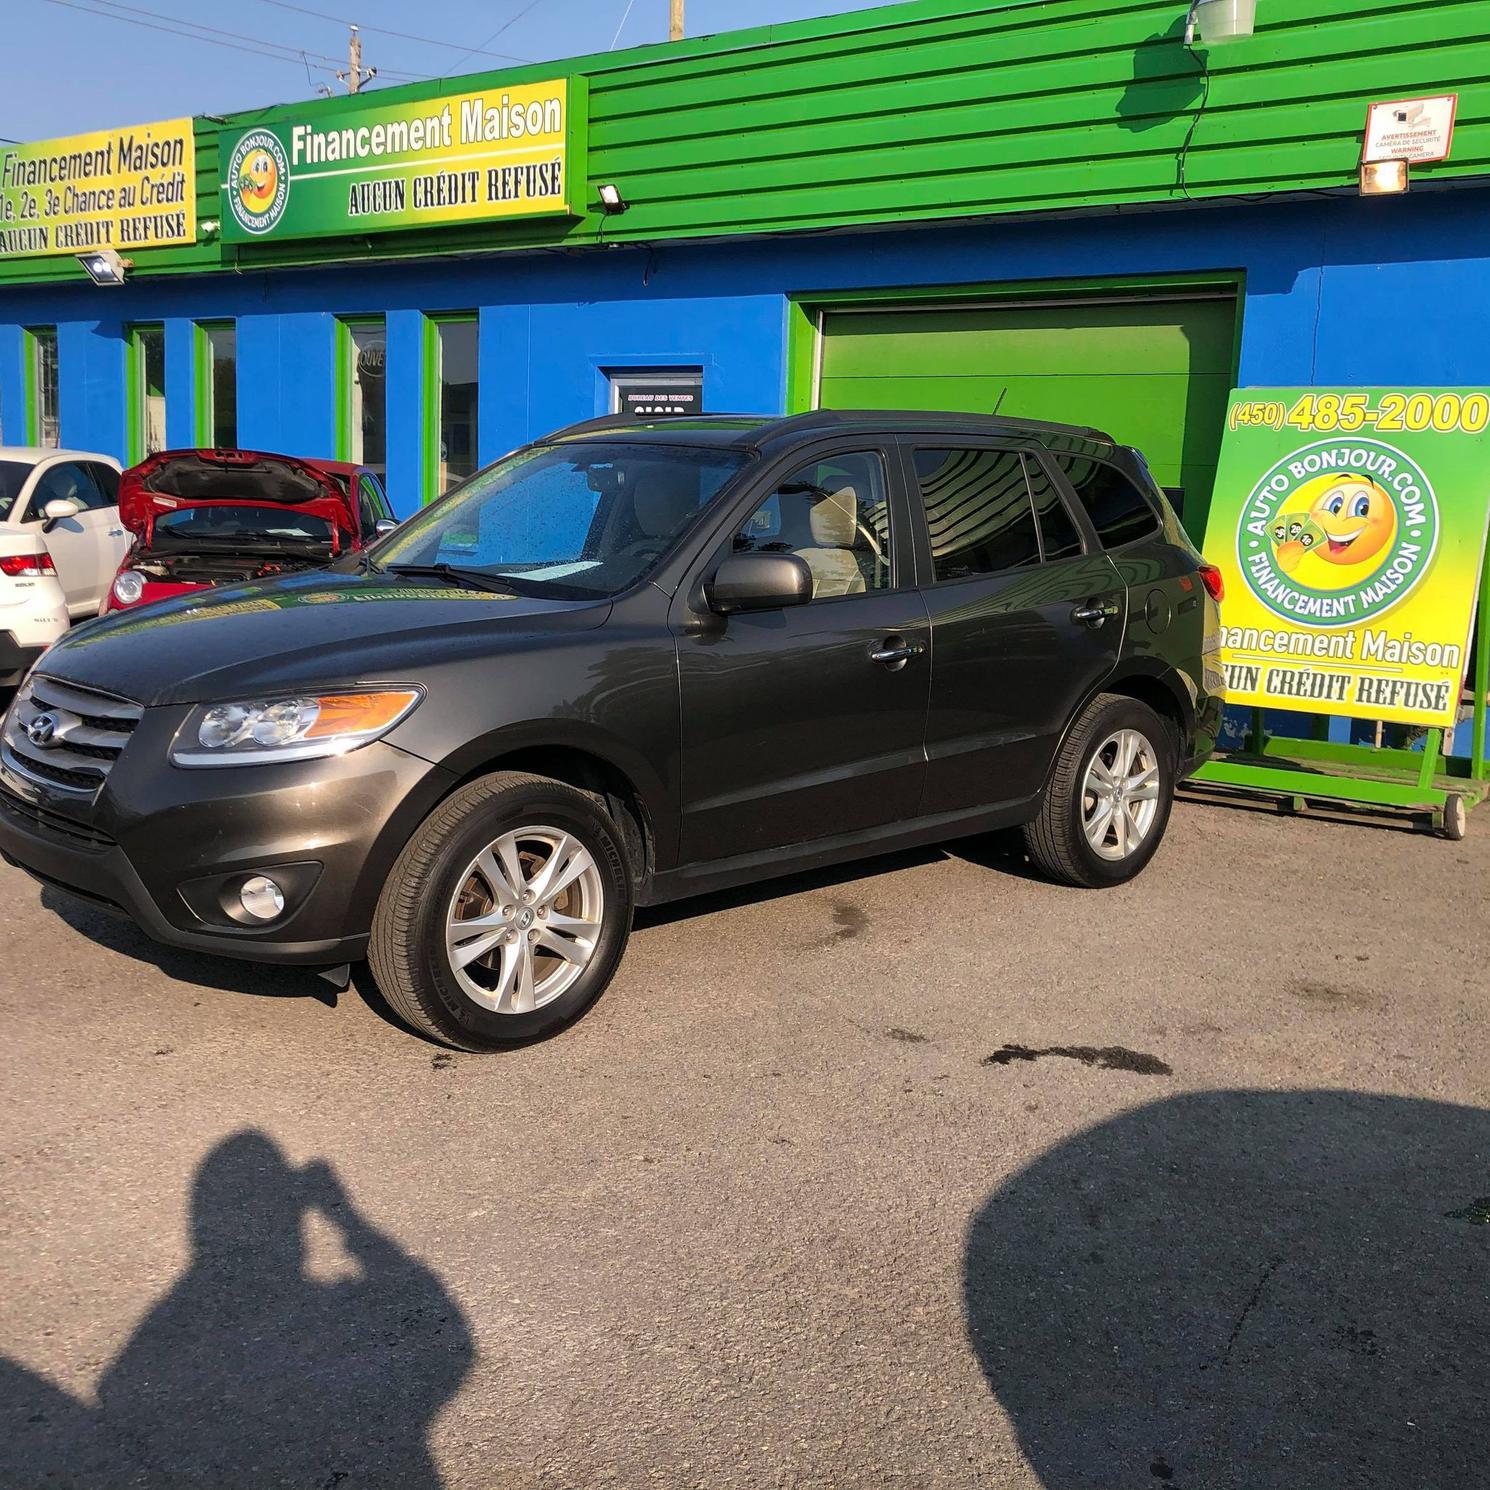 Hyundai Santa Fe CUIR - TOIT - BAS MILLAGE                                           89$/SEMAINE 2012